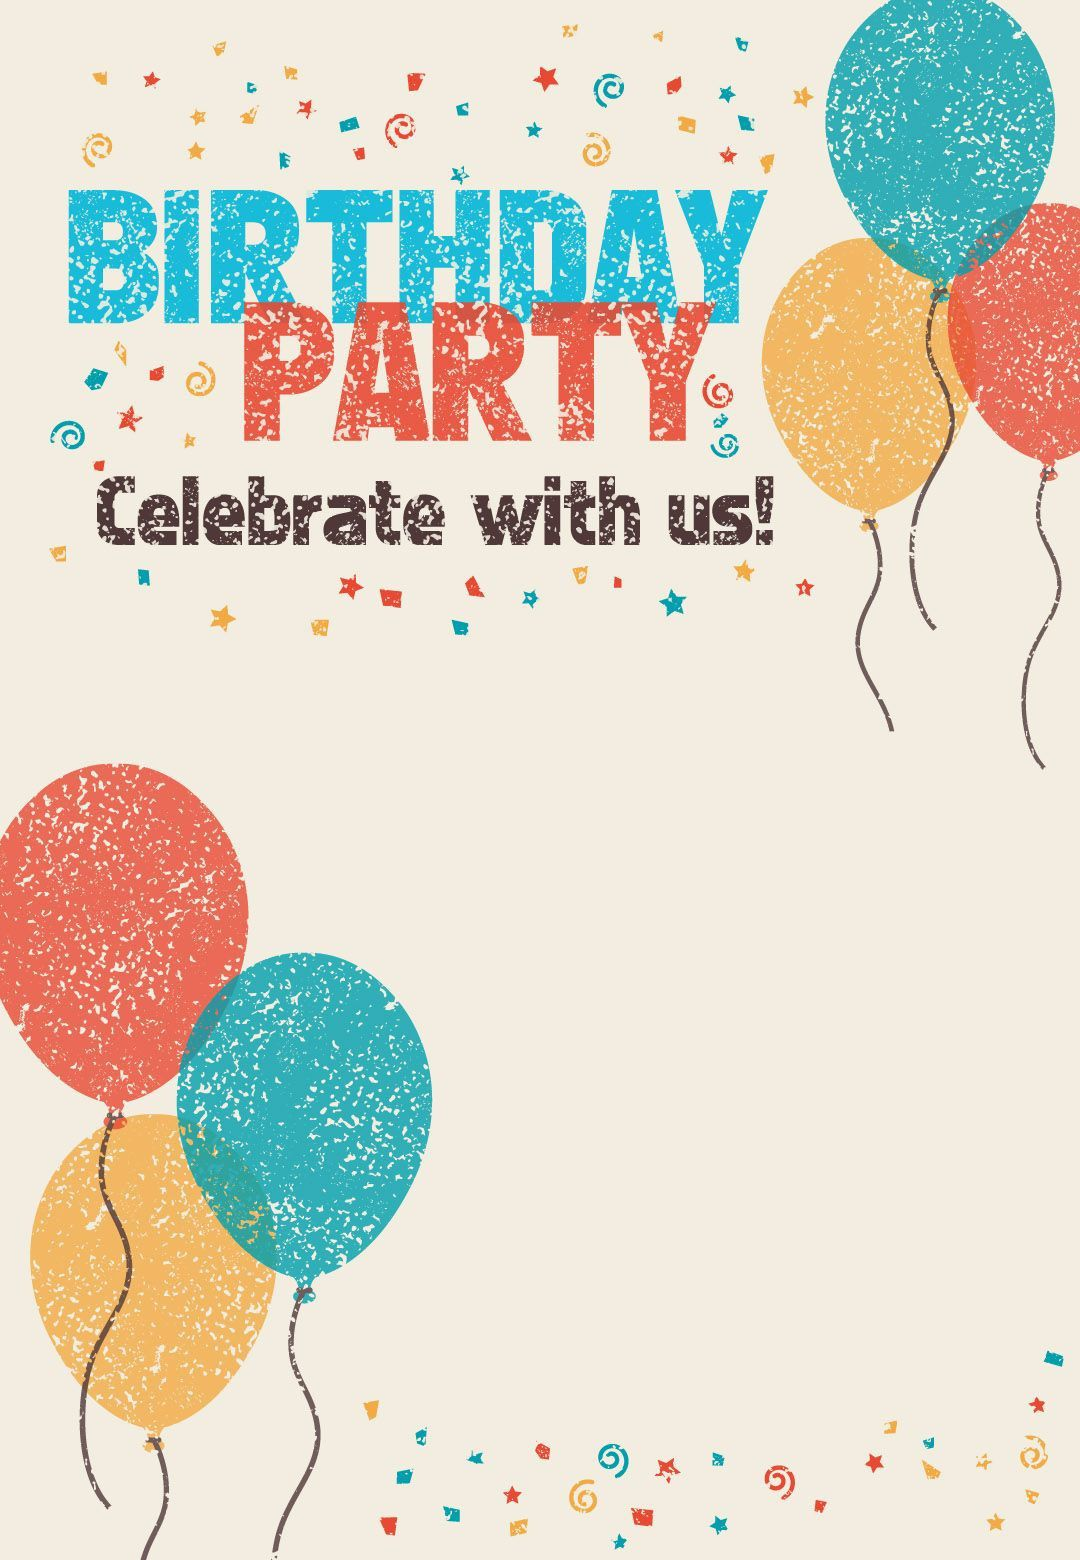 002 Excellent Free Birthday Party Invitation Template Design  Templates Printable 16th Australia UkFull